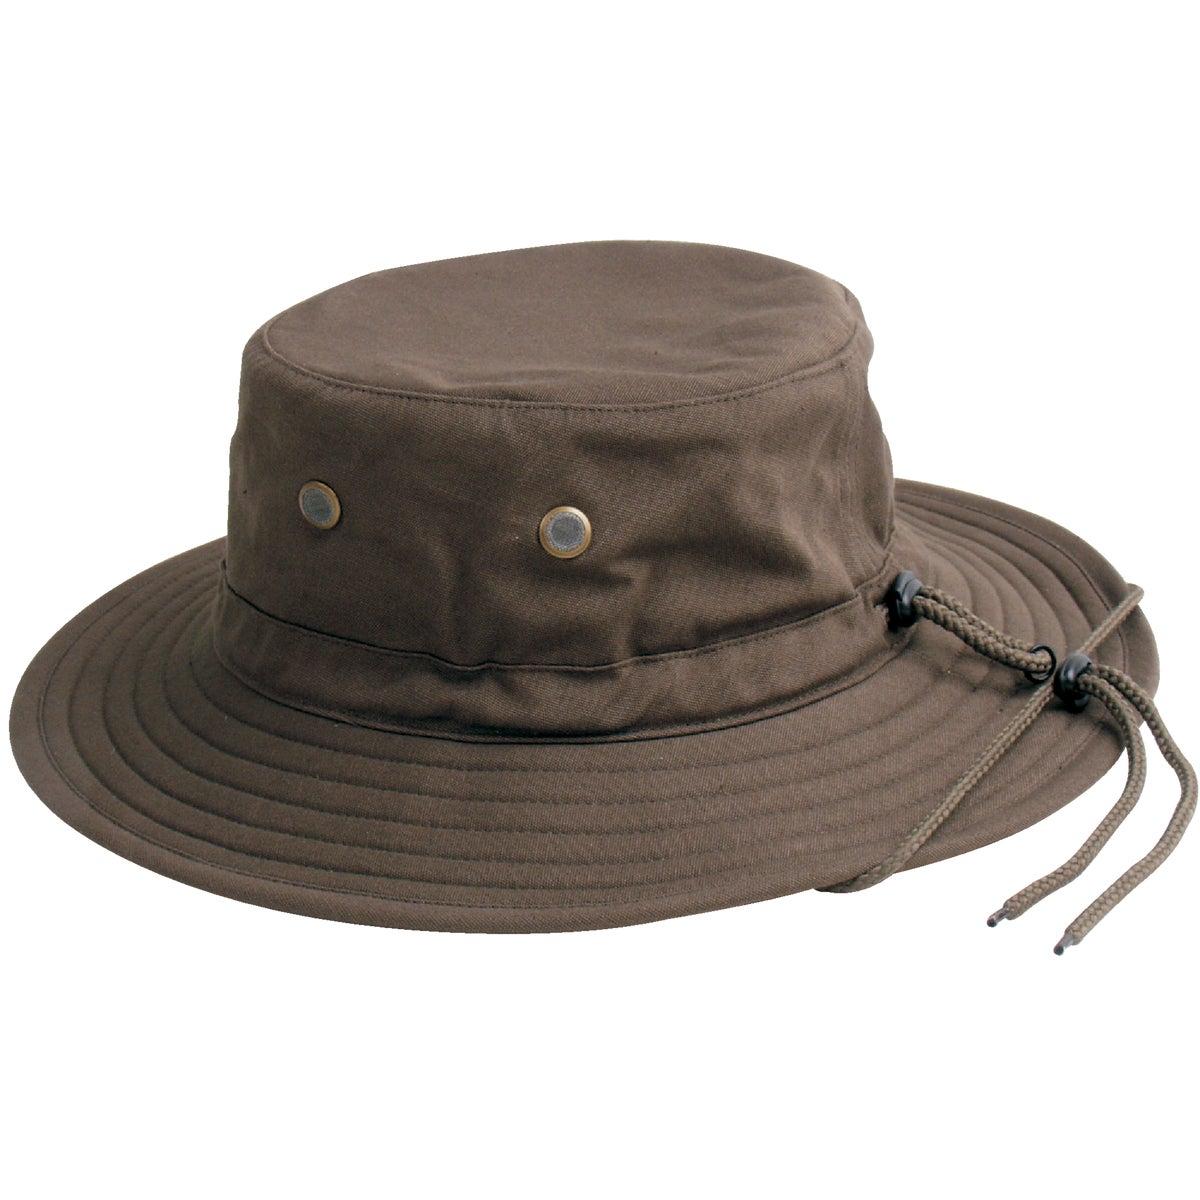 MENS DK BRN COTTON HAT